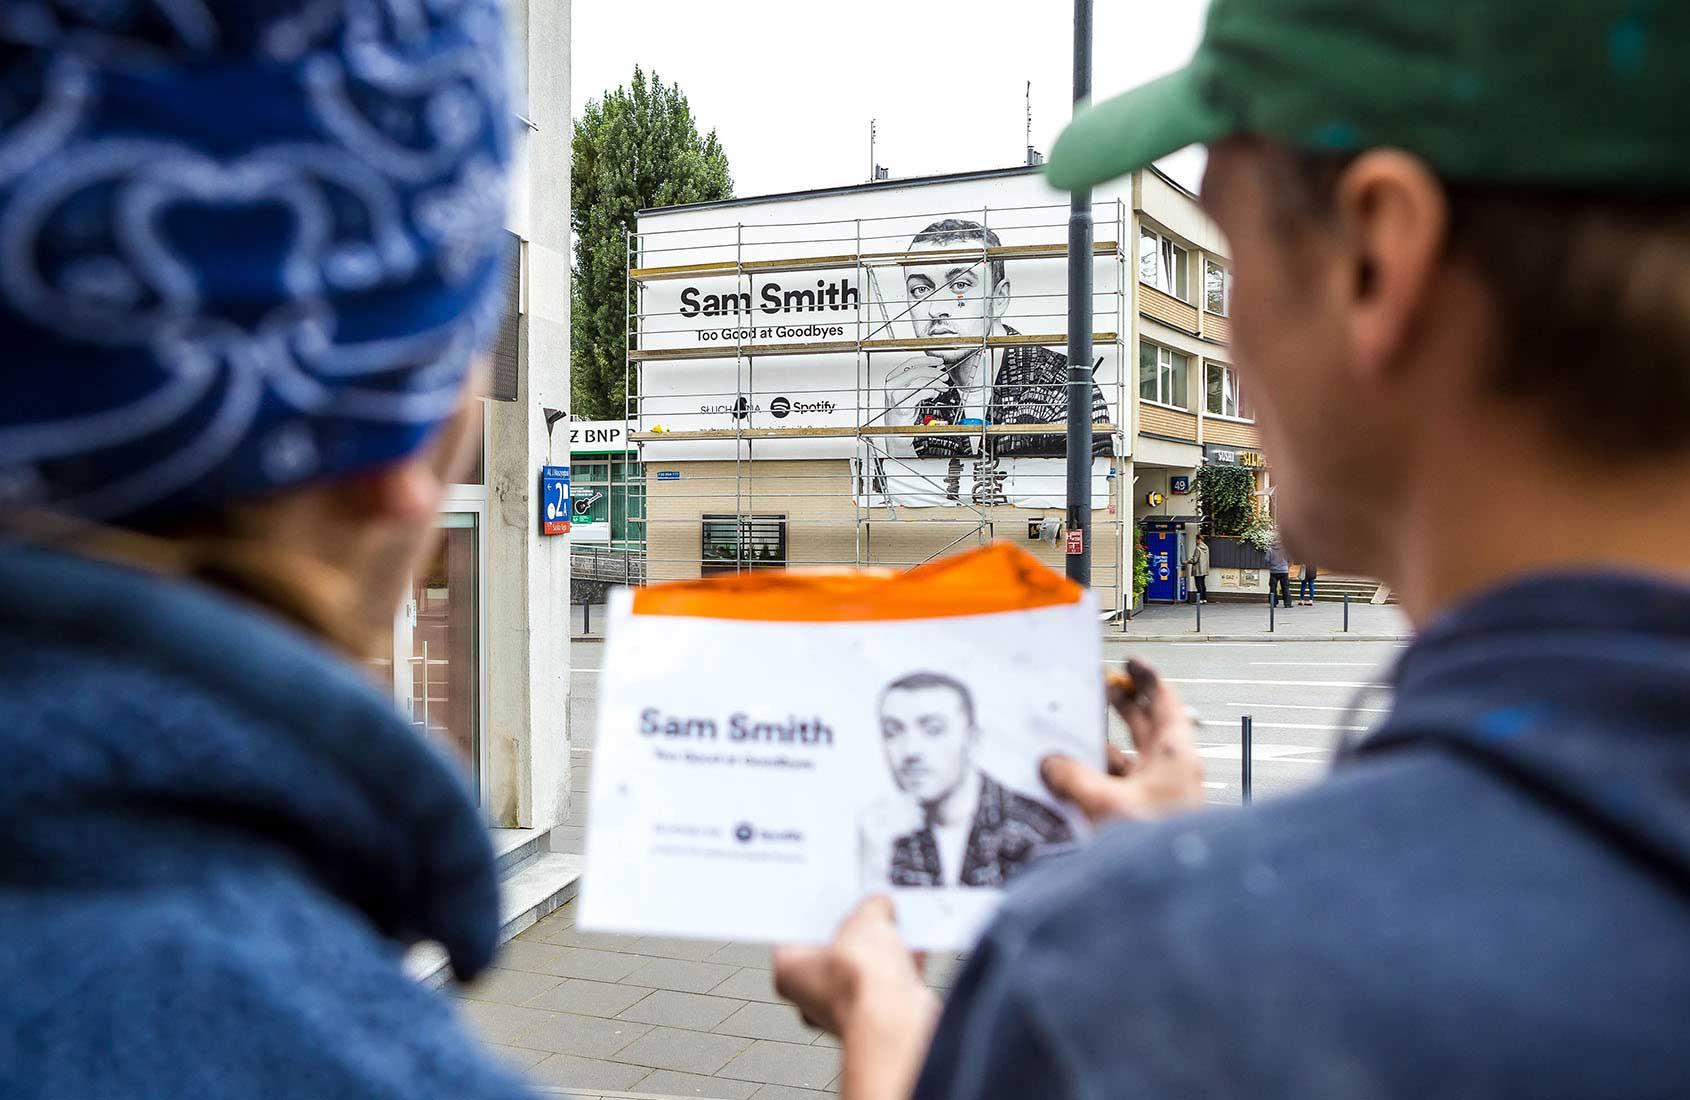 SAM SMITH 02 Spotify IDEAMO Francuska PGE Narodowy Mural